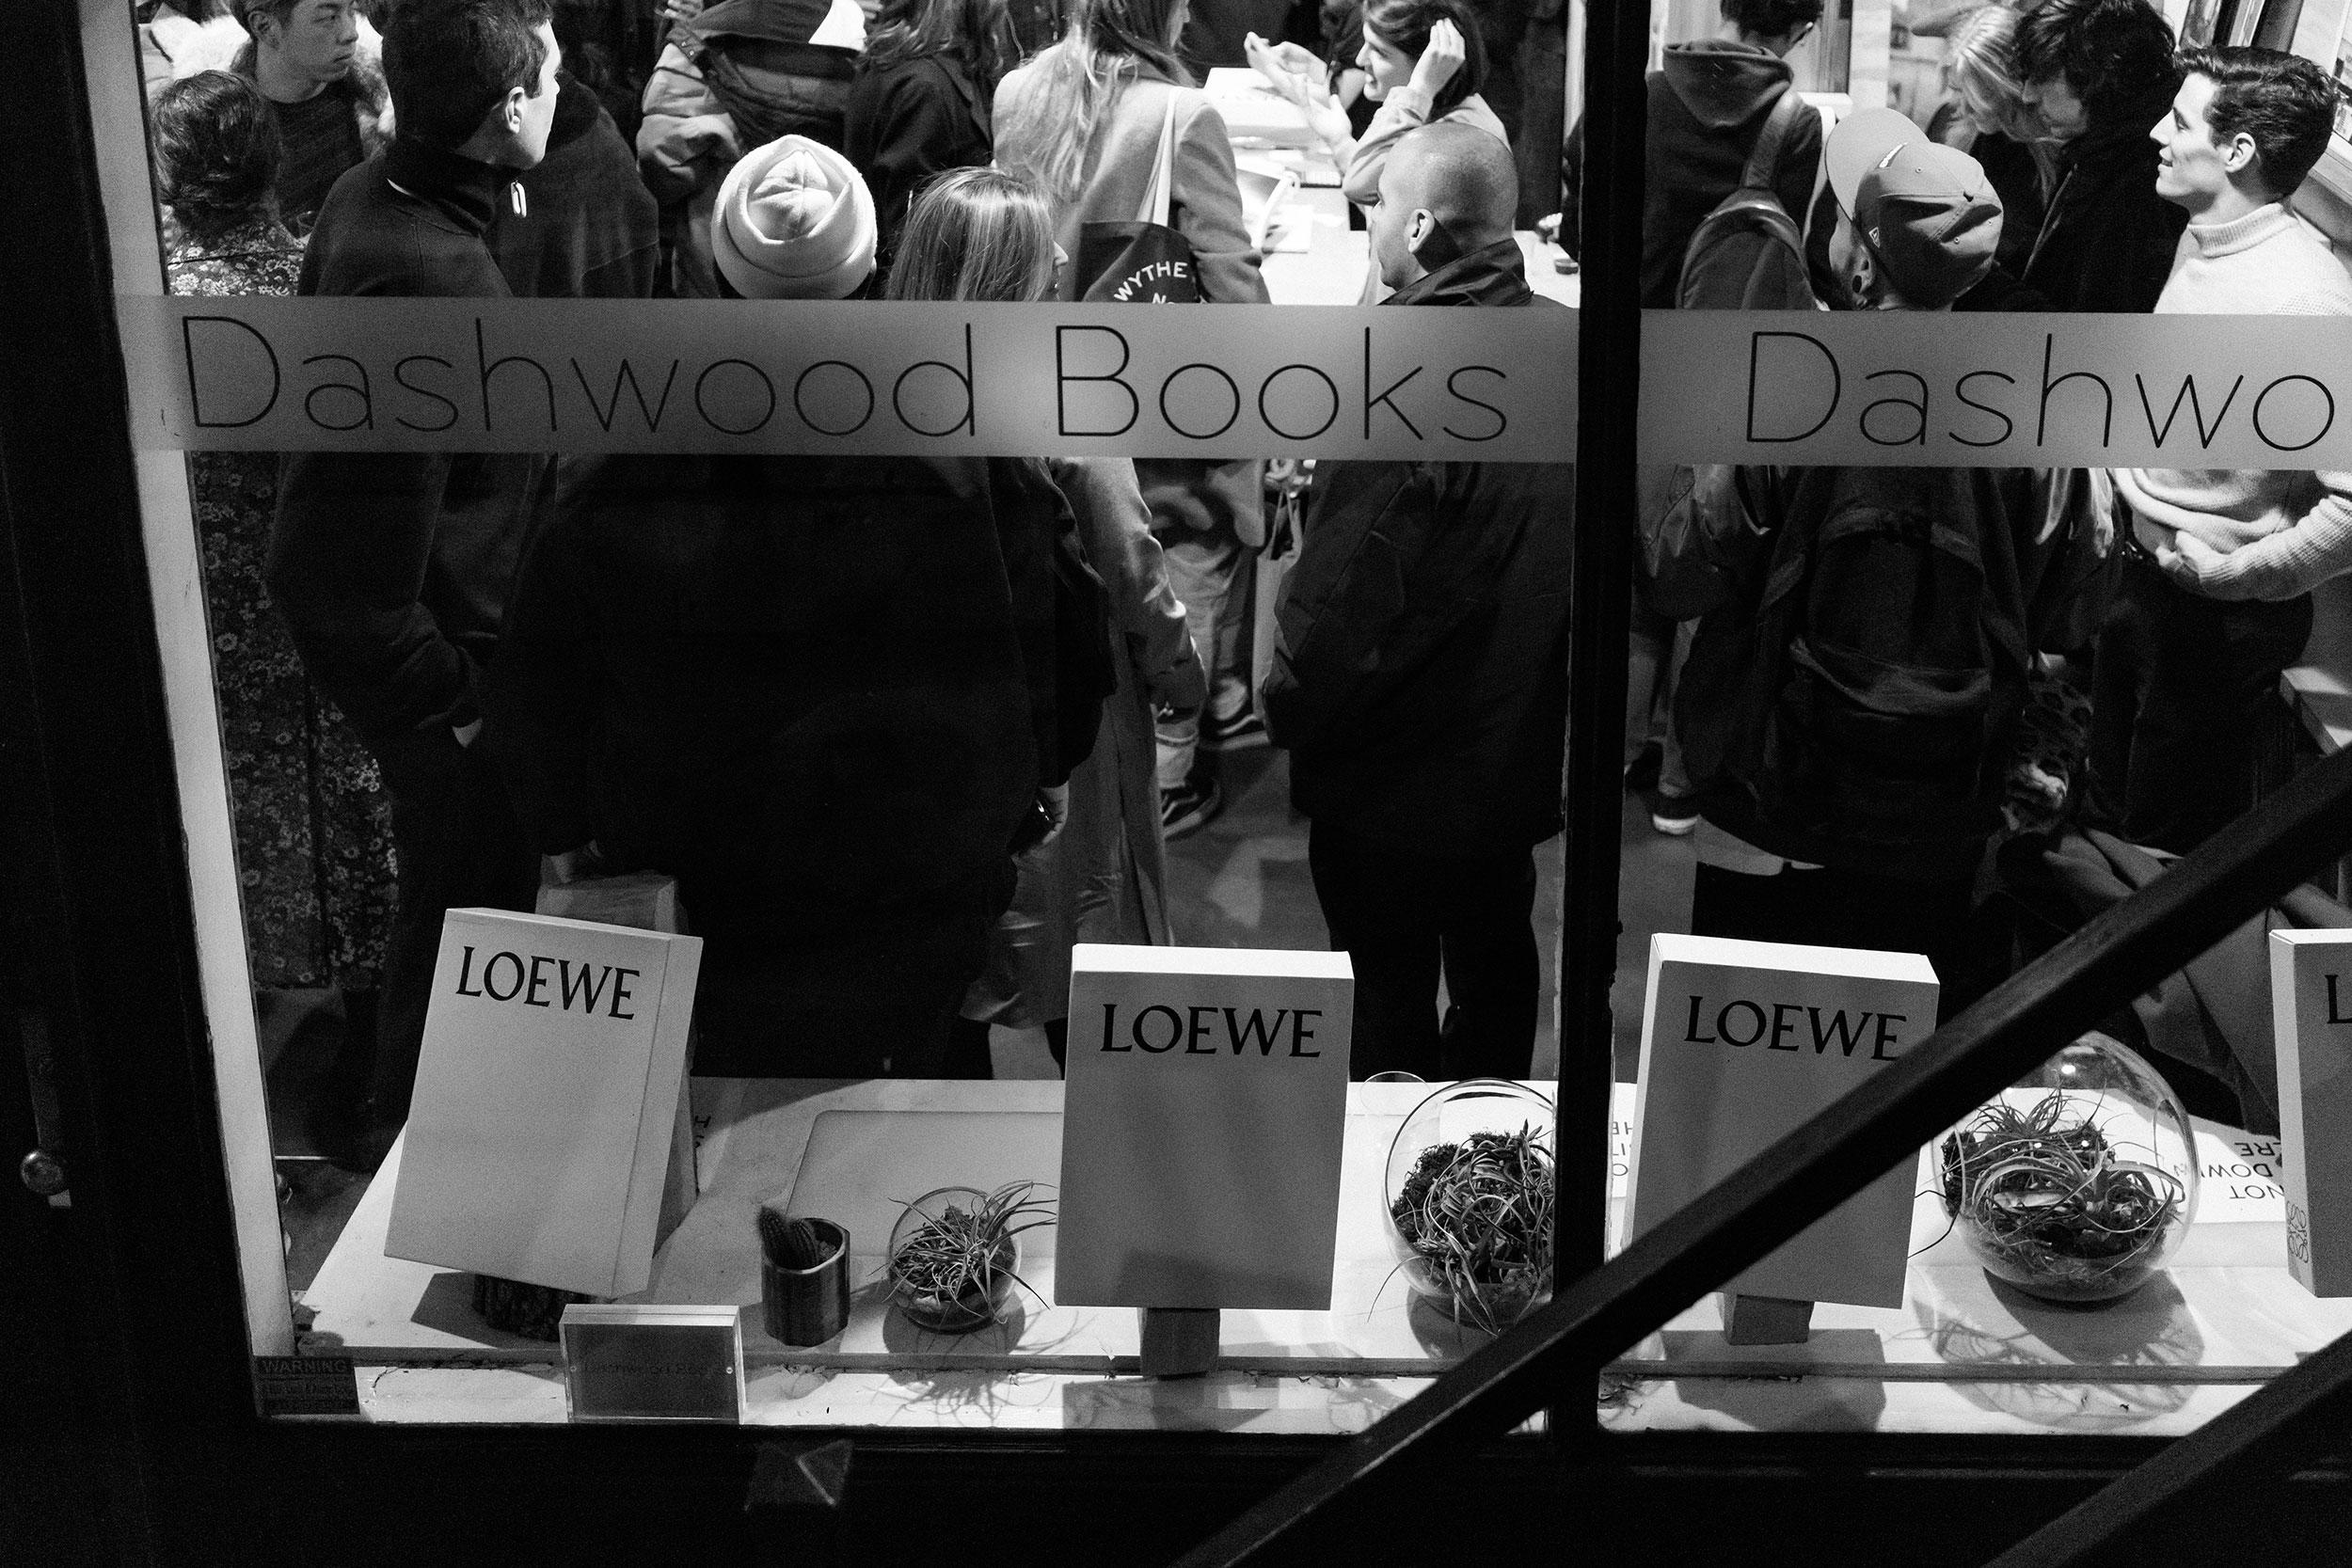 LOEWE  Past, Present, Future Book Signing w/ Jonathan Anderson & Luis Venegas at Dashwood Books